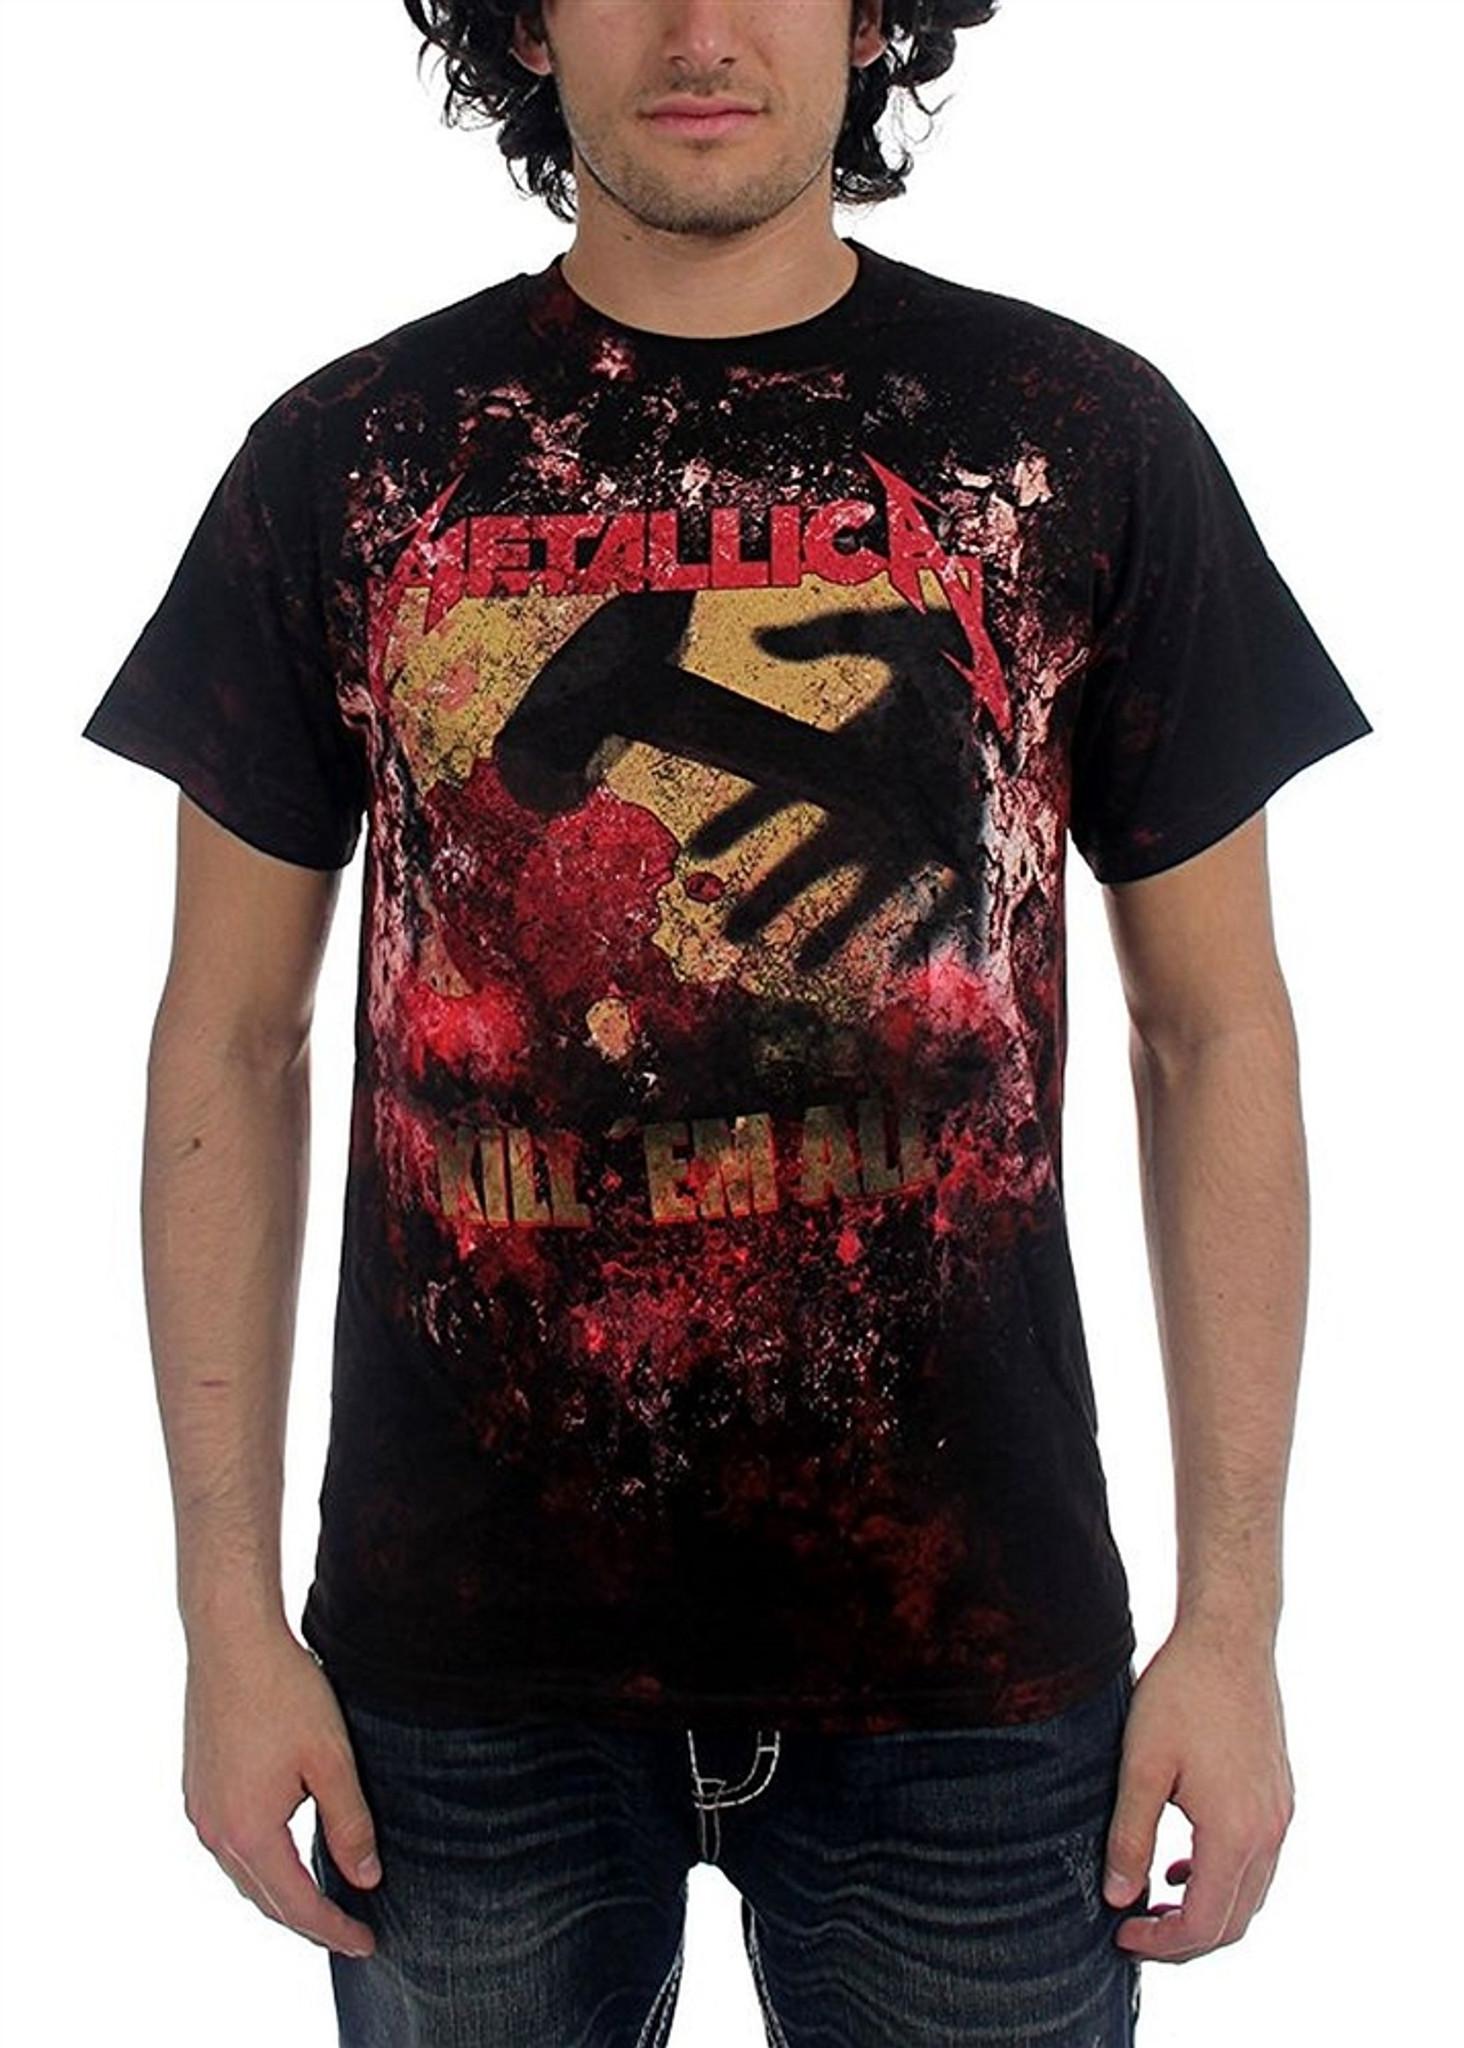 IconSymbol Funny KillEm All Studio Album Metallica Baby Onesie Kids Bodysuits